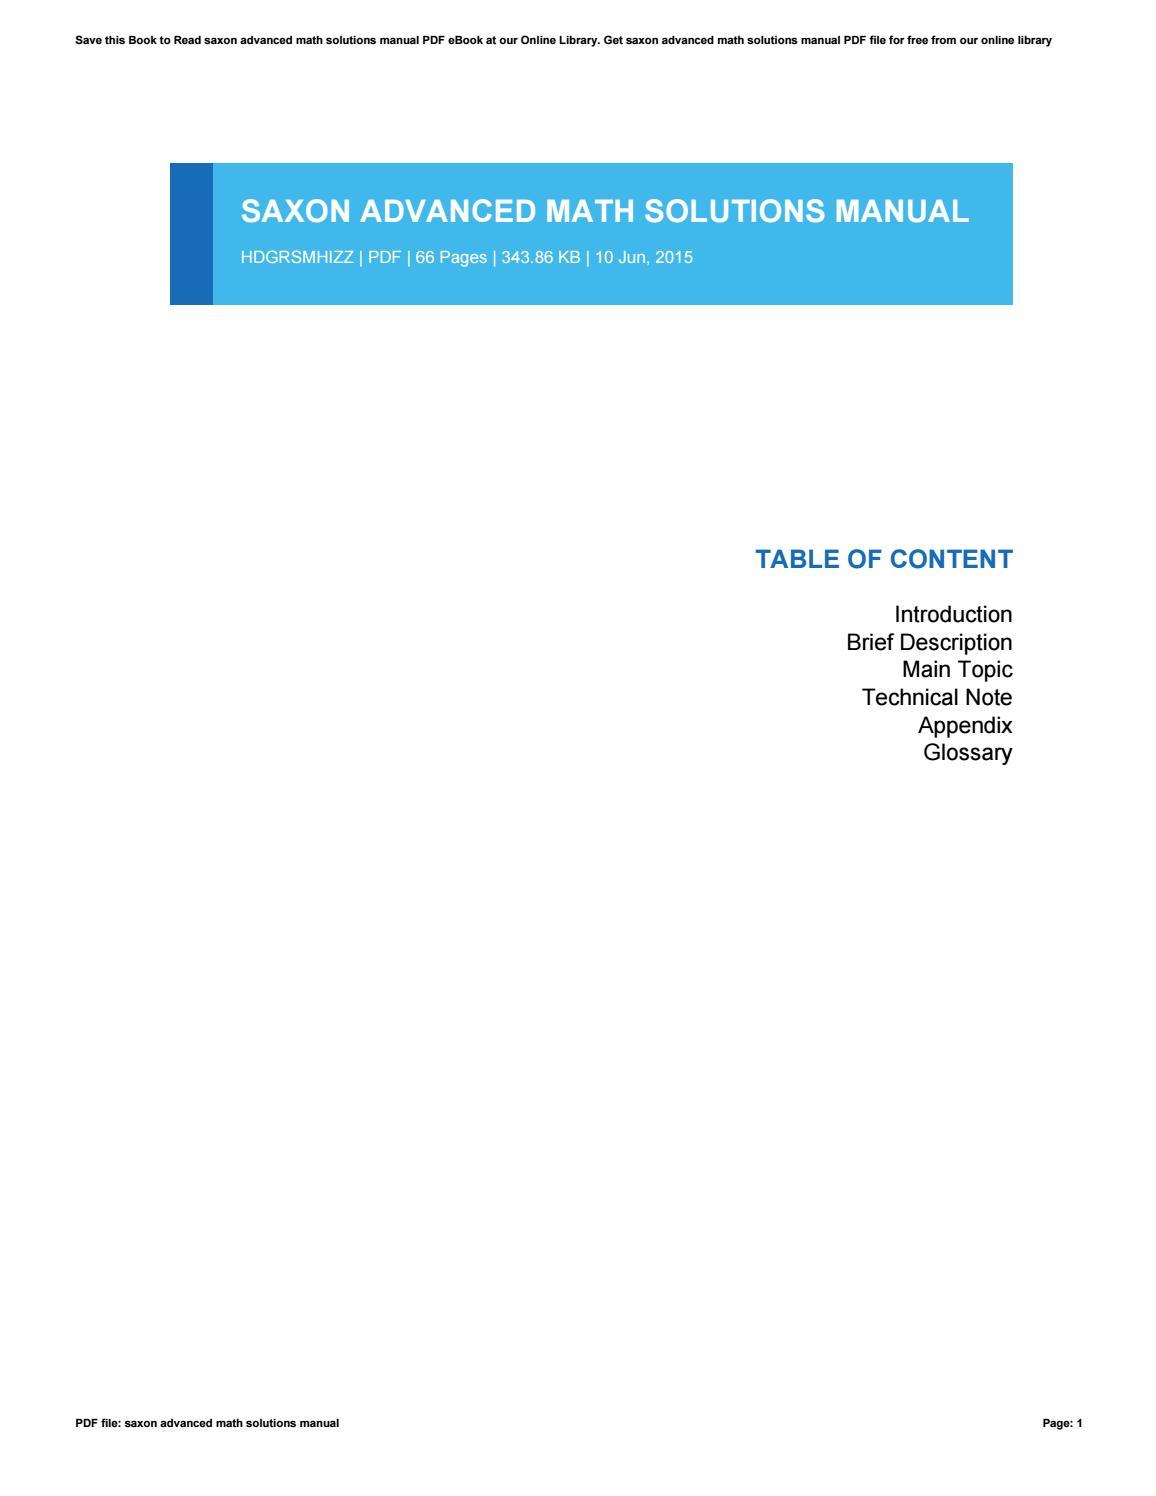 Saxon advanced math solutions manual by GaryDrake2662 - issuu